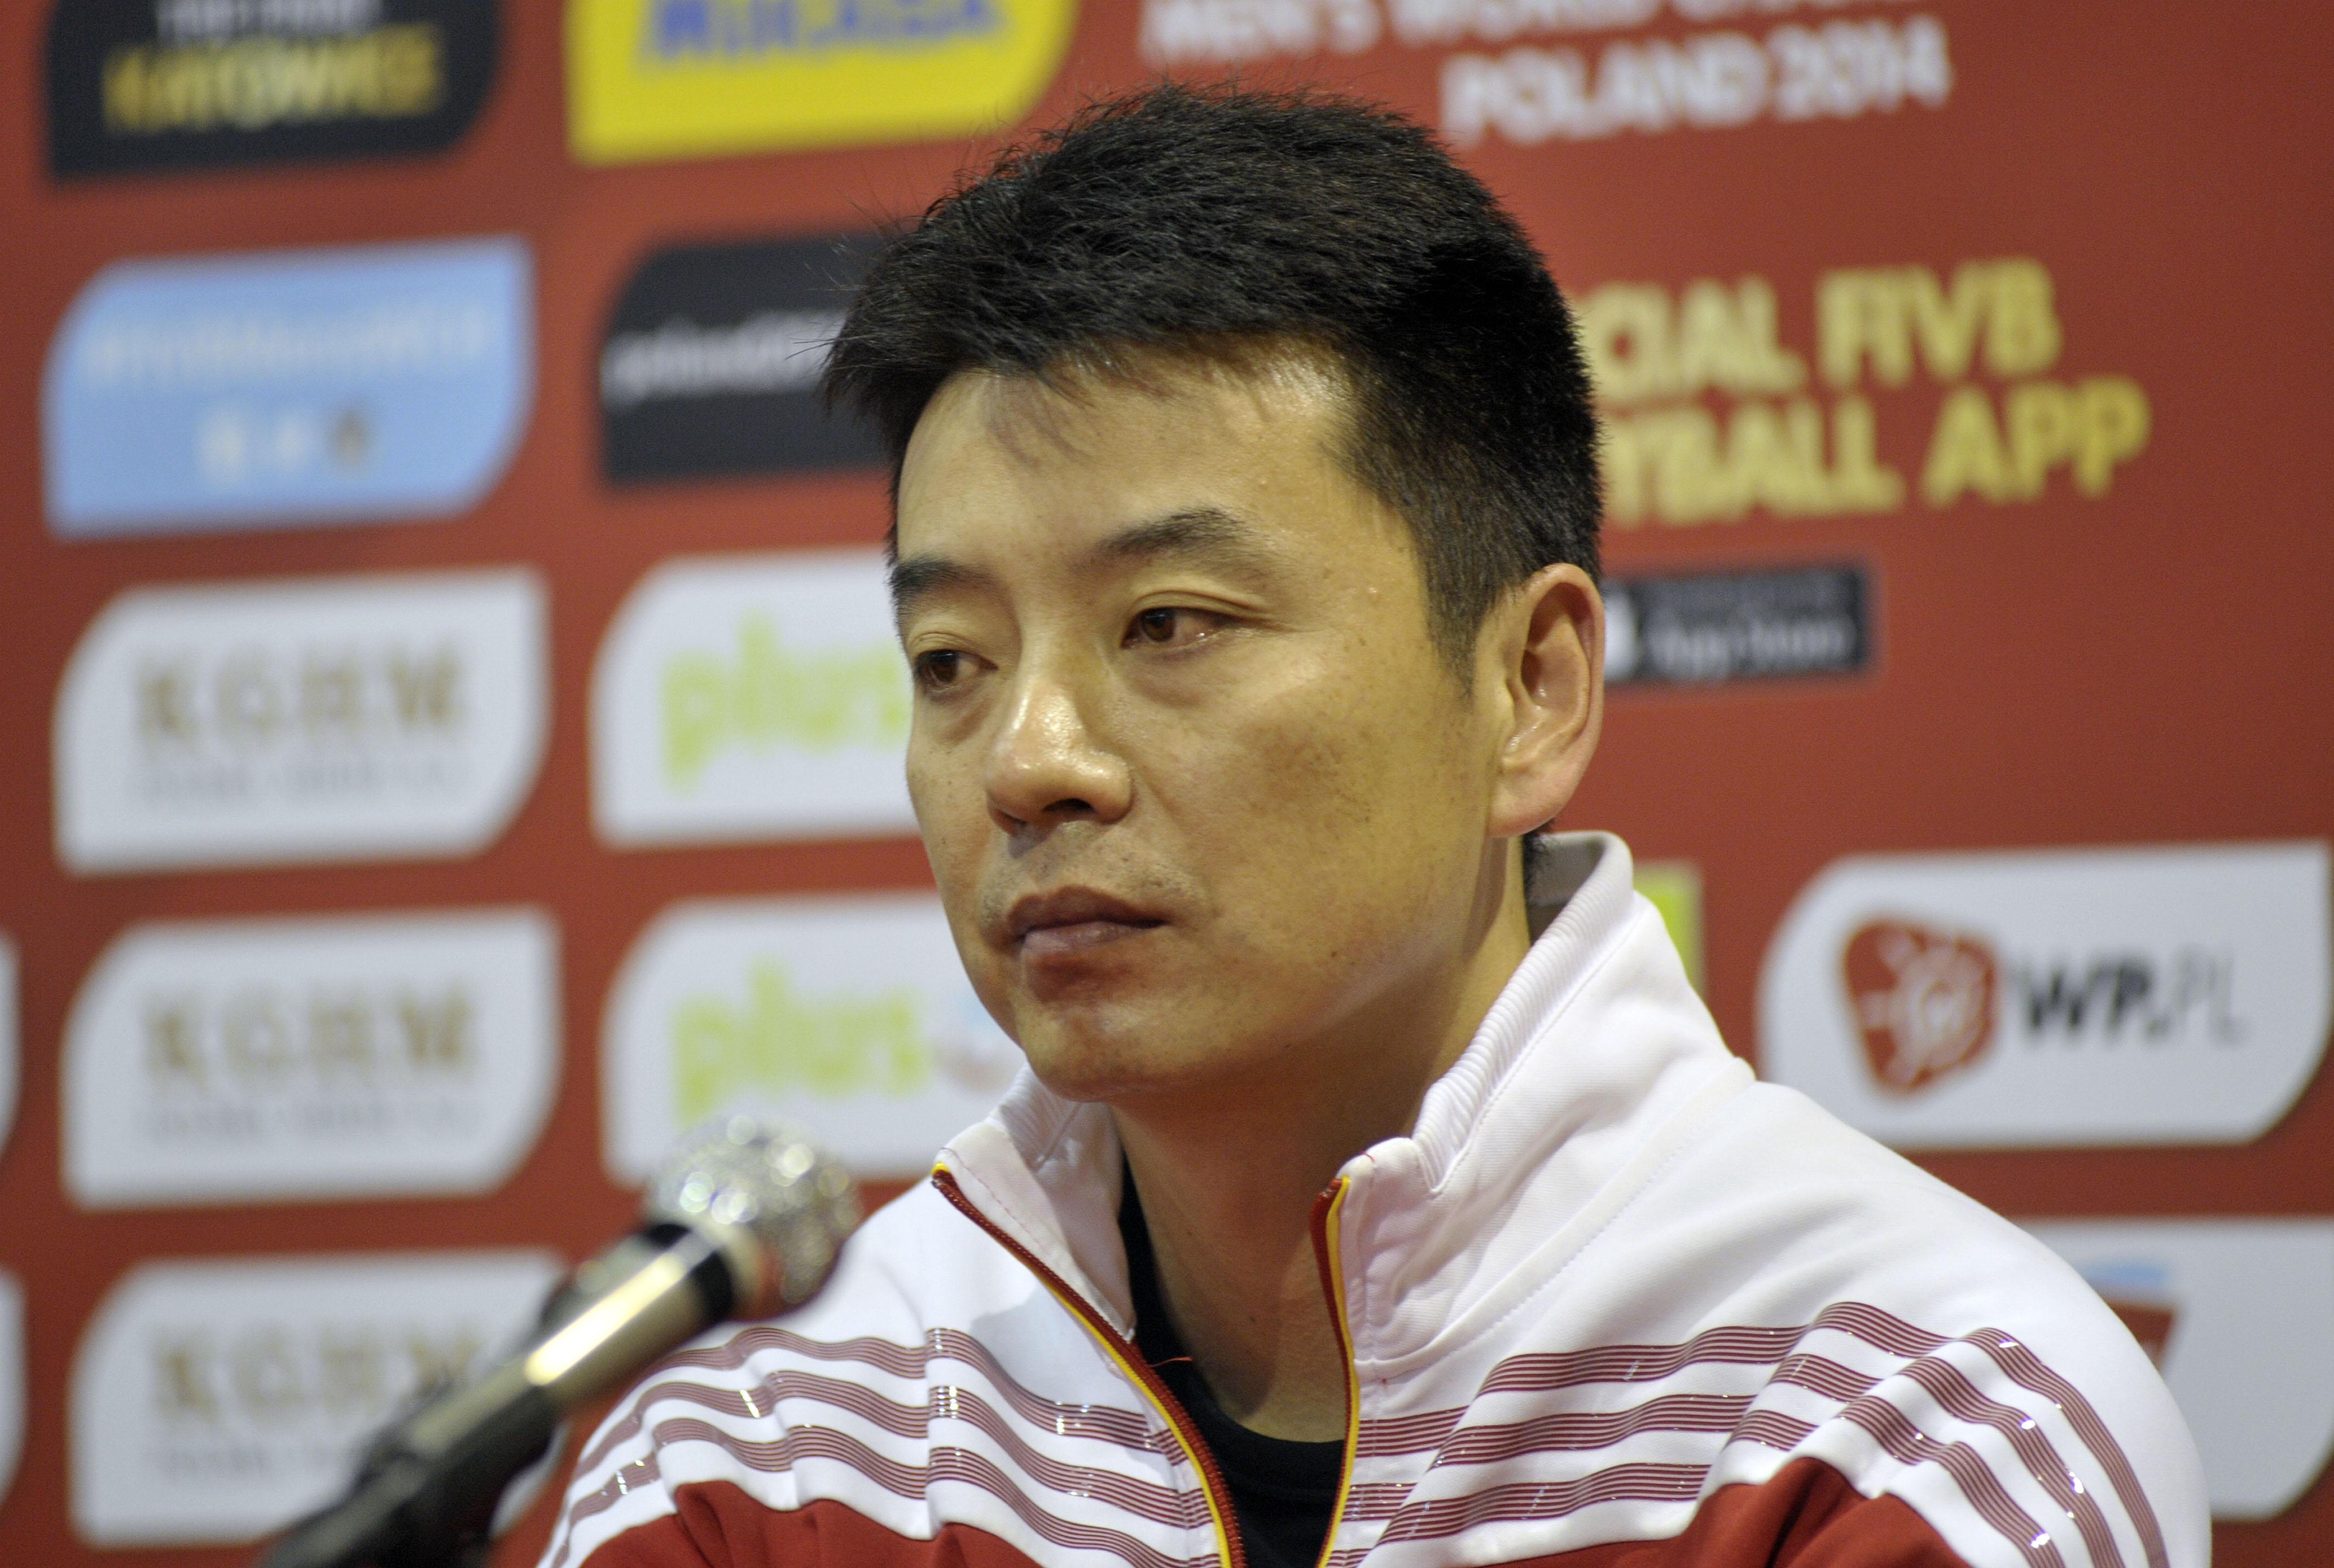 Xie Guochen